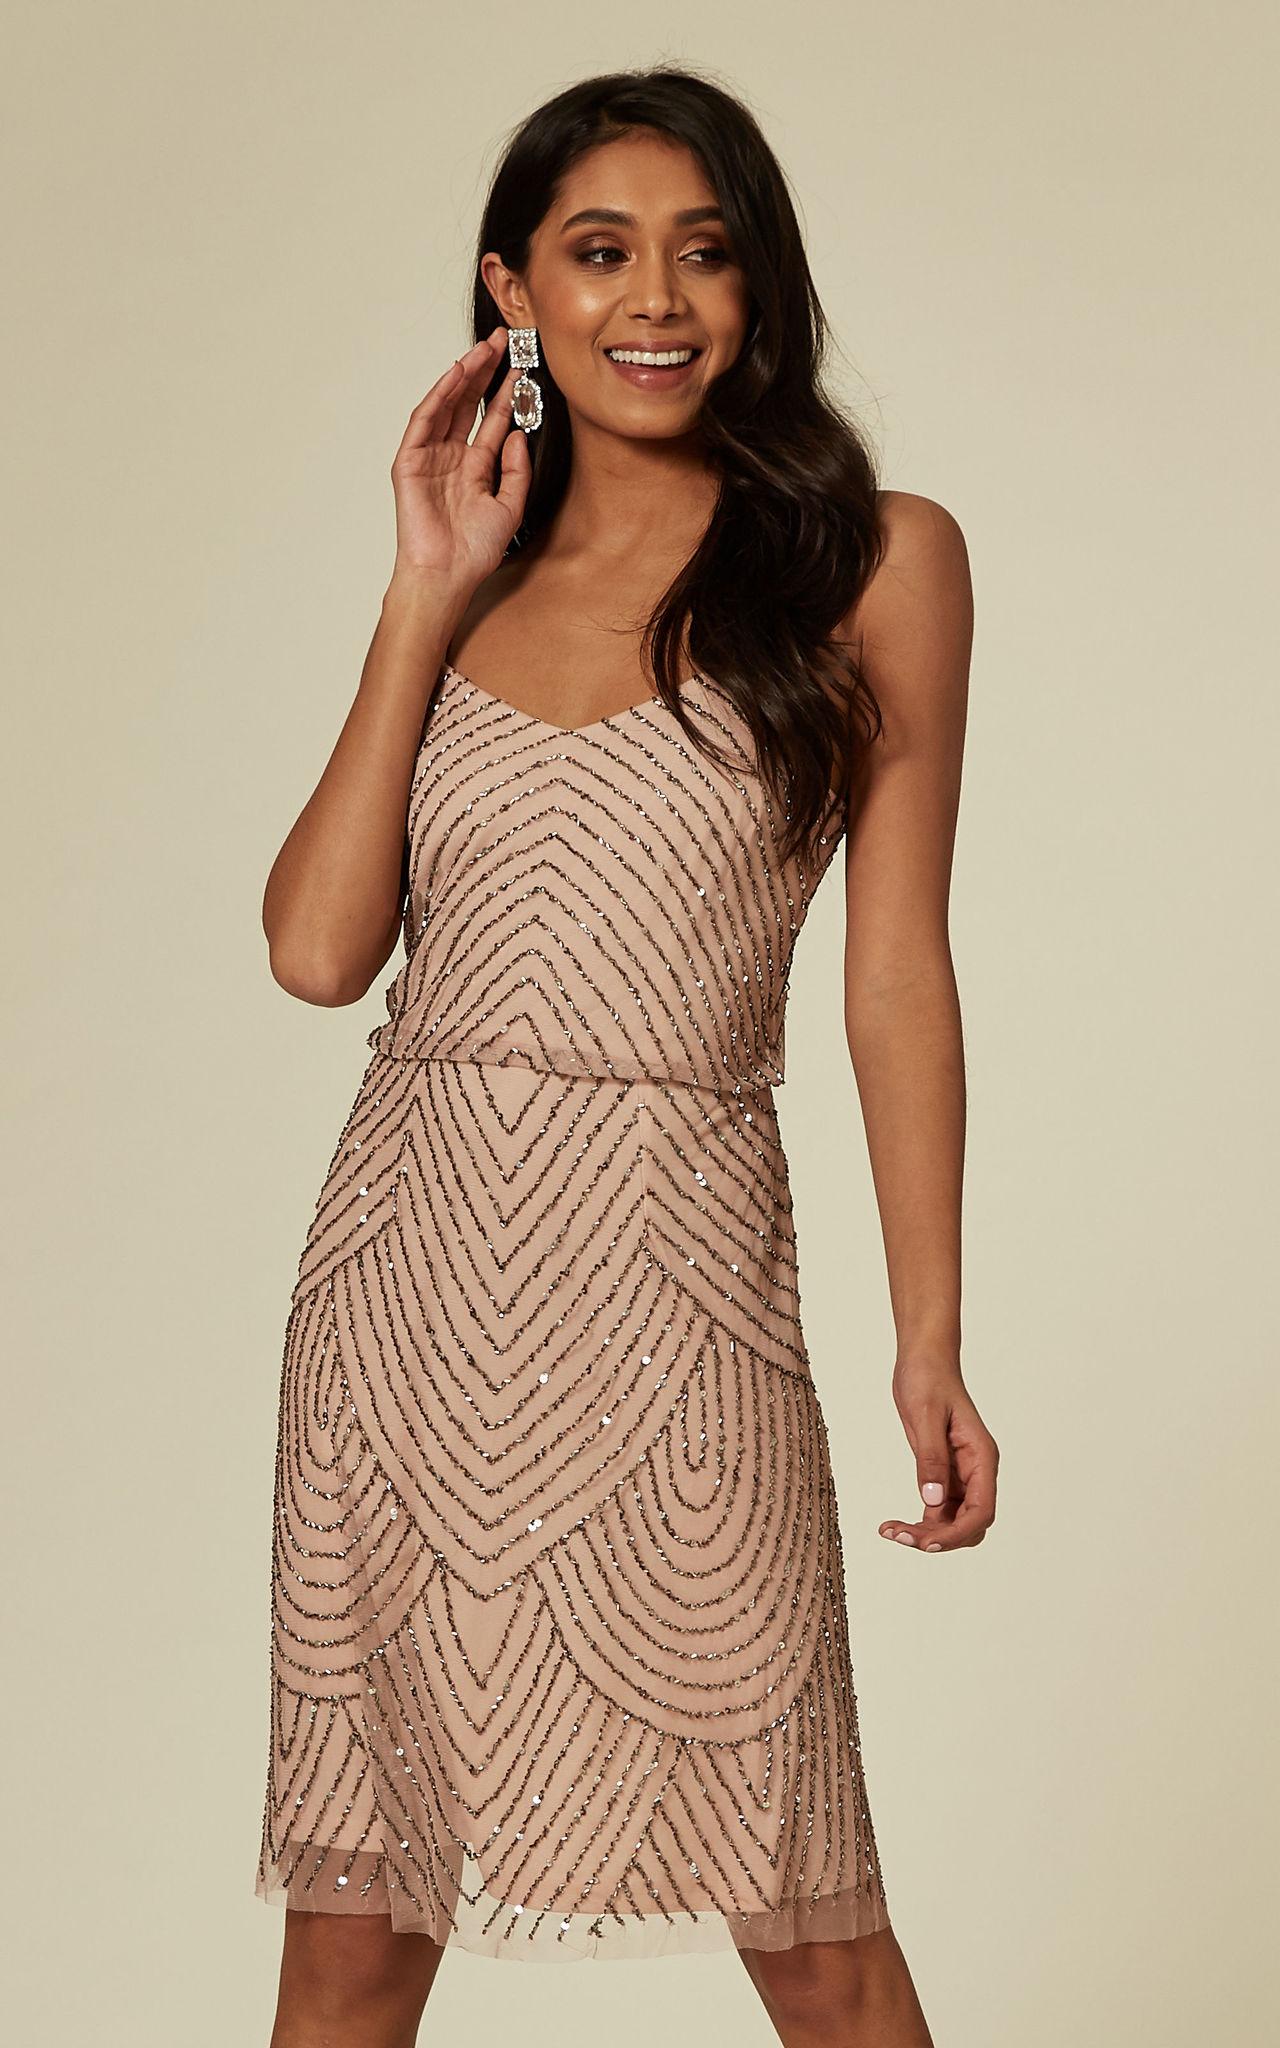 Sequin mini dress in pink